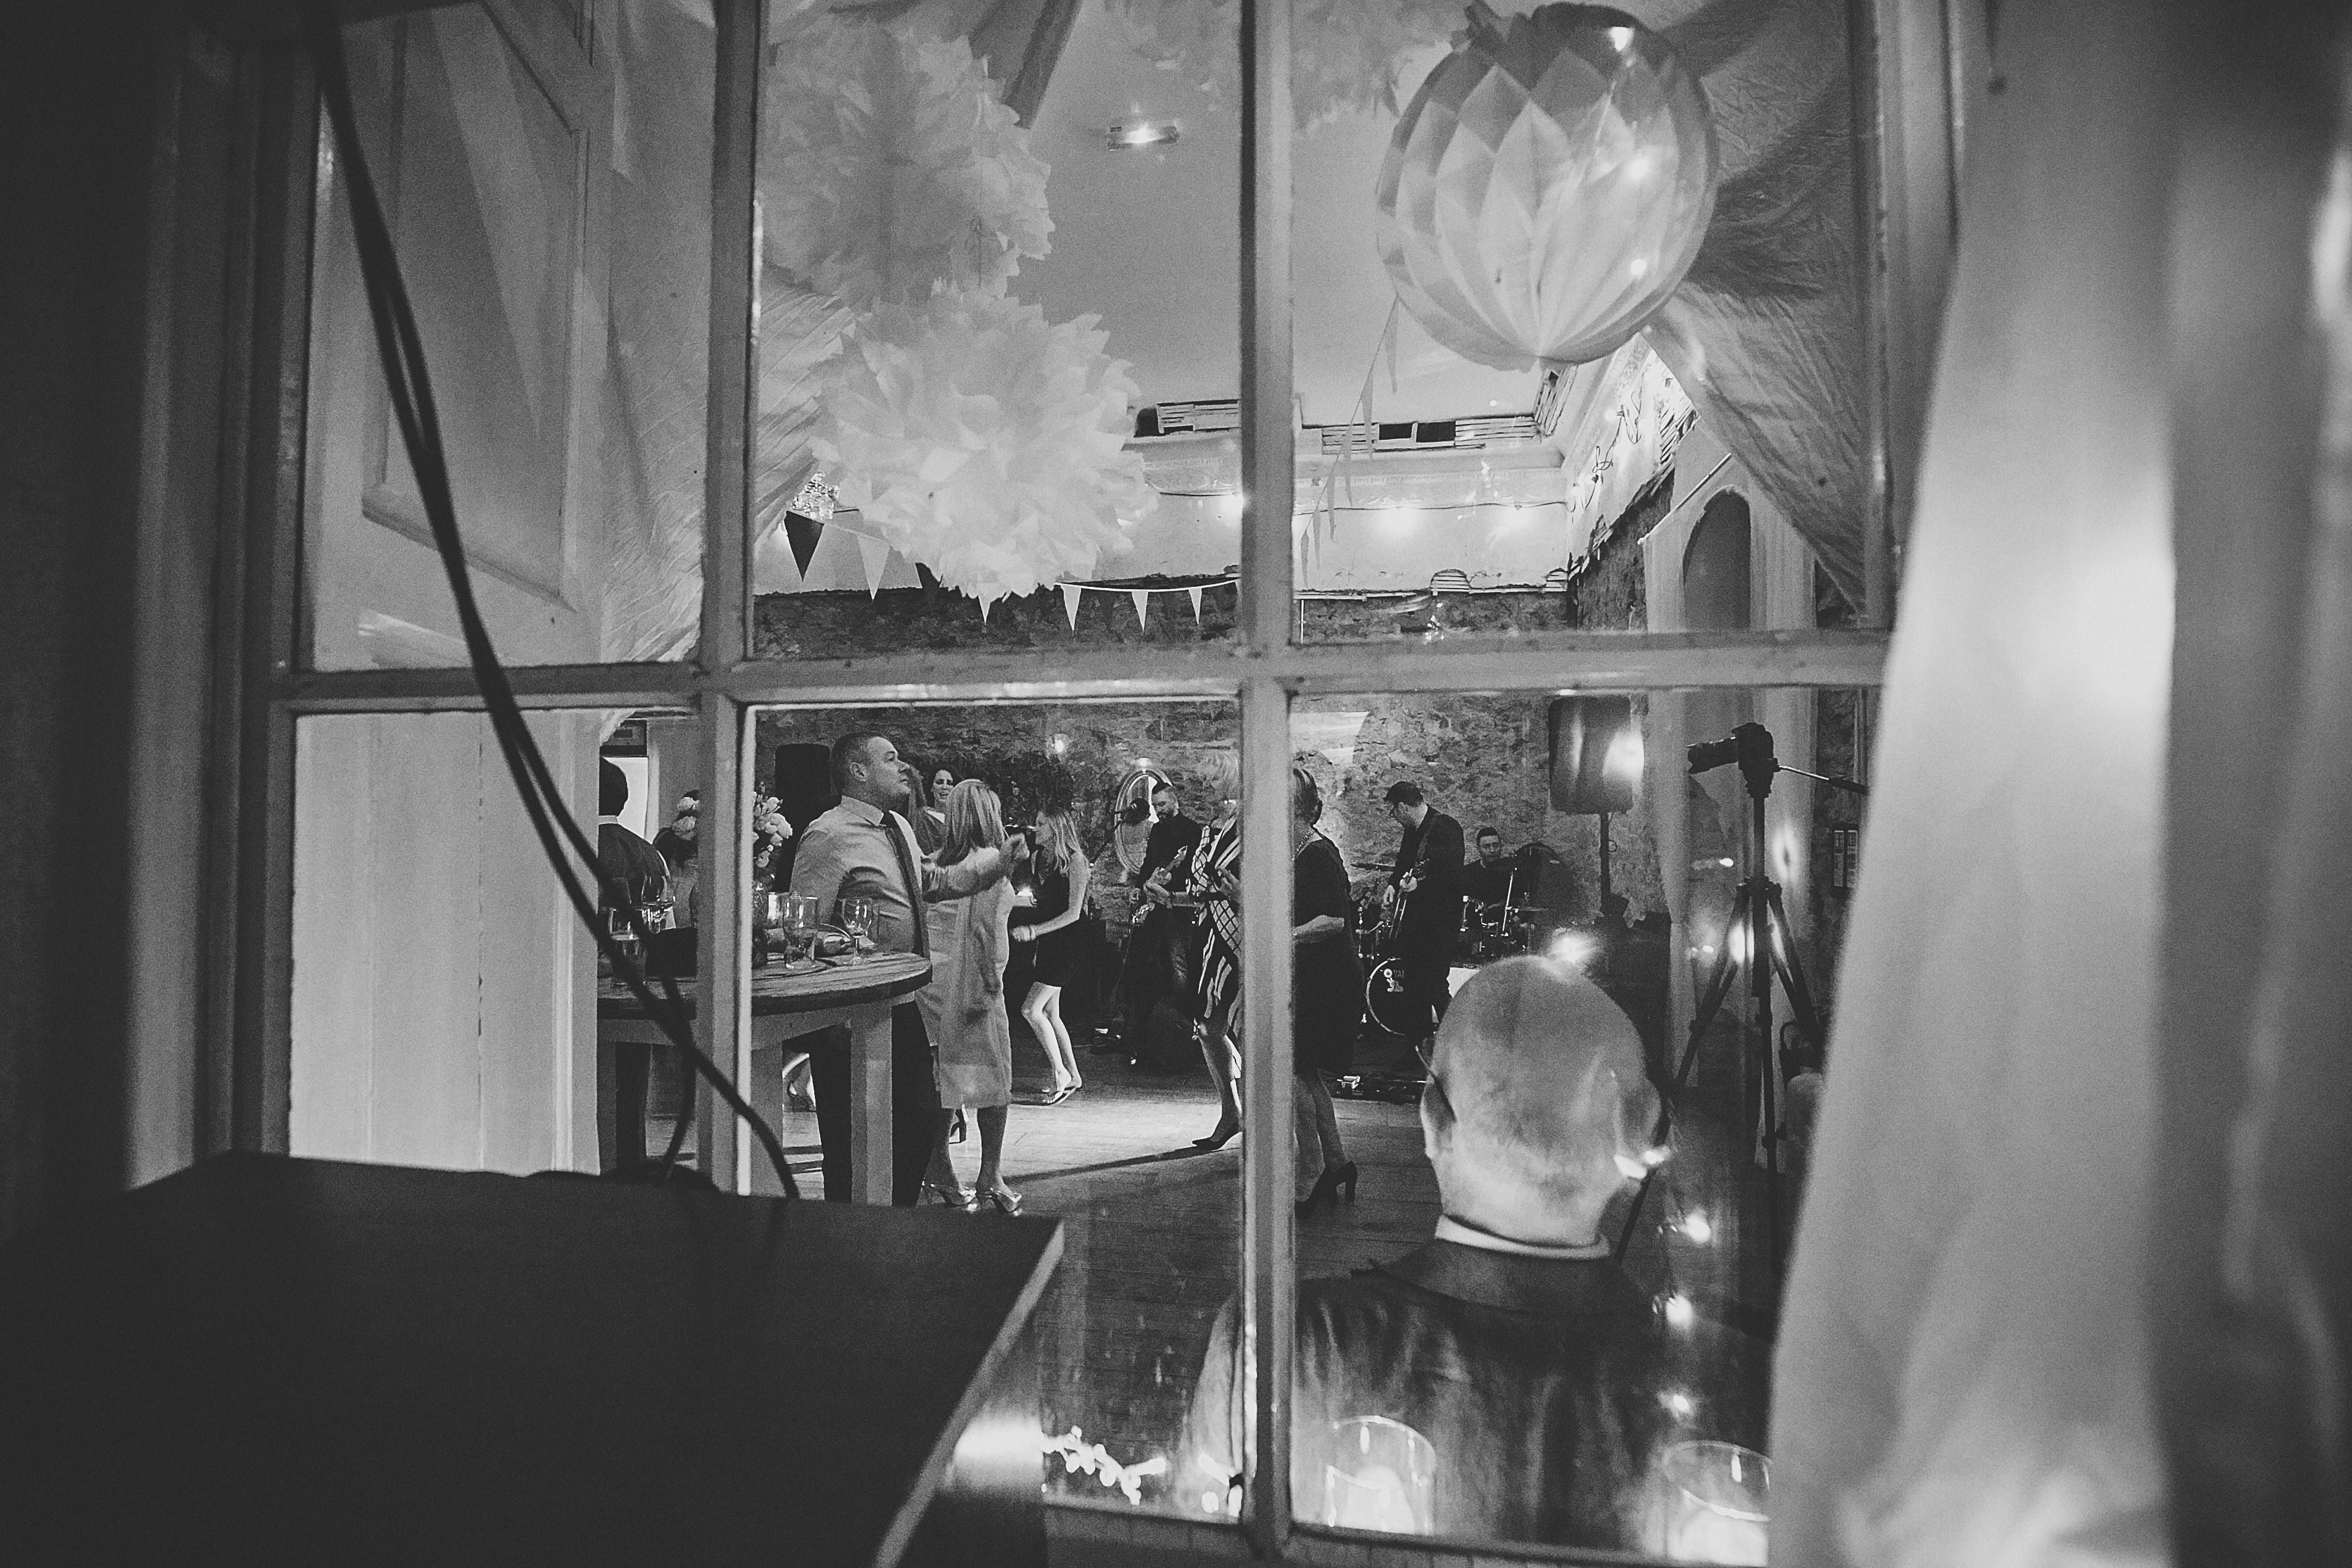 Cloughjordan House weddding170 - Cloughjordan House Wedding - Alternative Venue